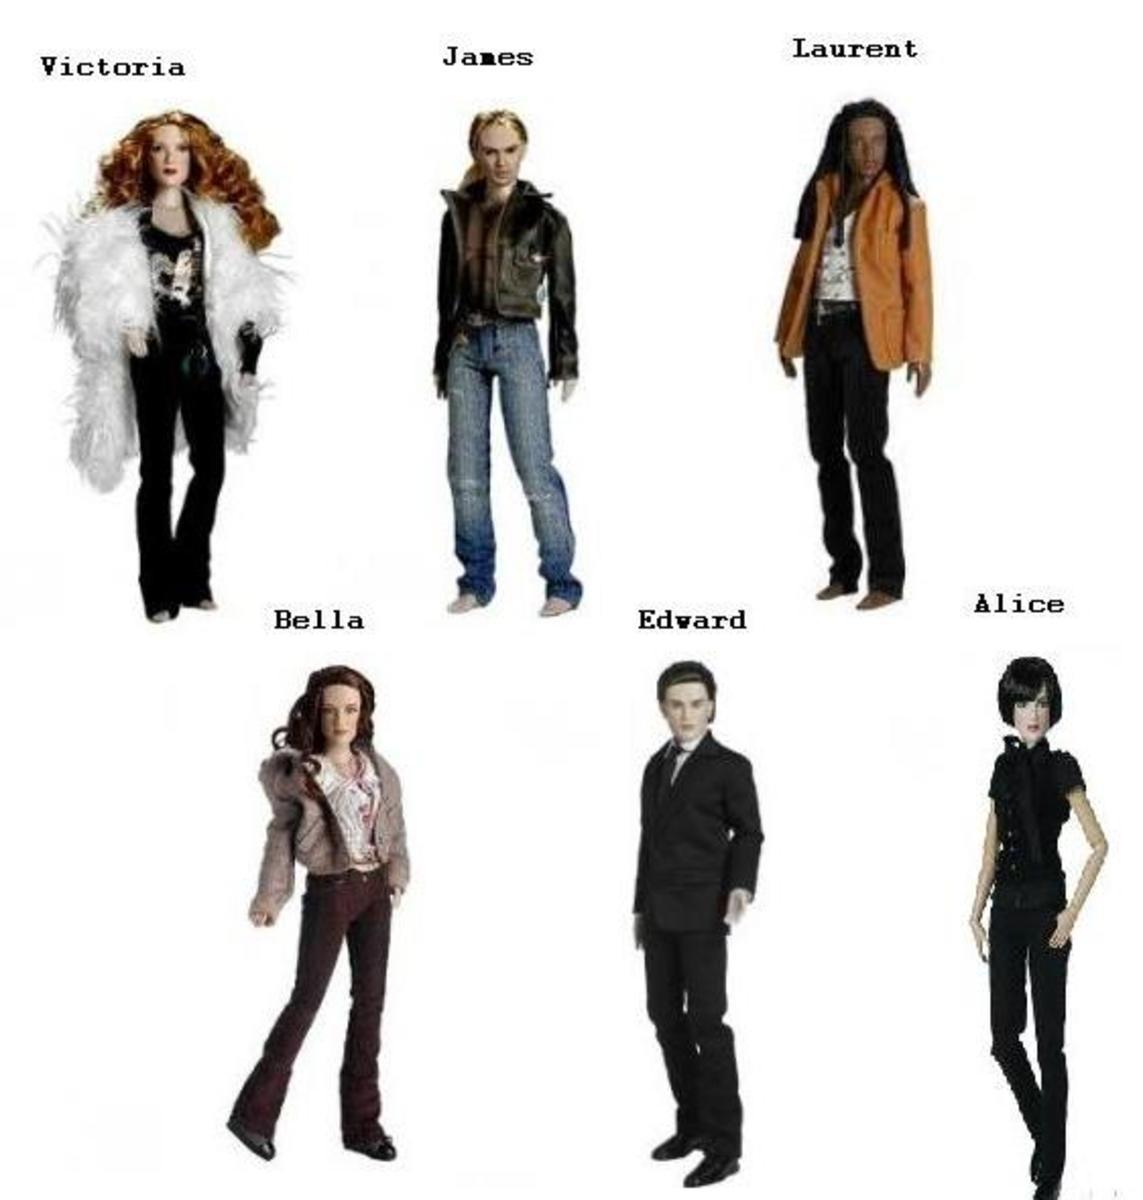 Twilight Tonner Dolls - Victoria, James, Laurent. Bella, Edward and Alice